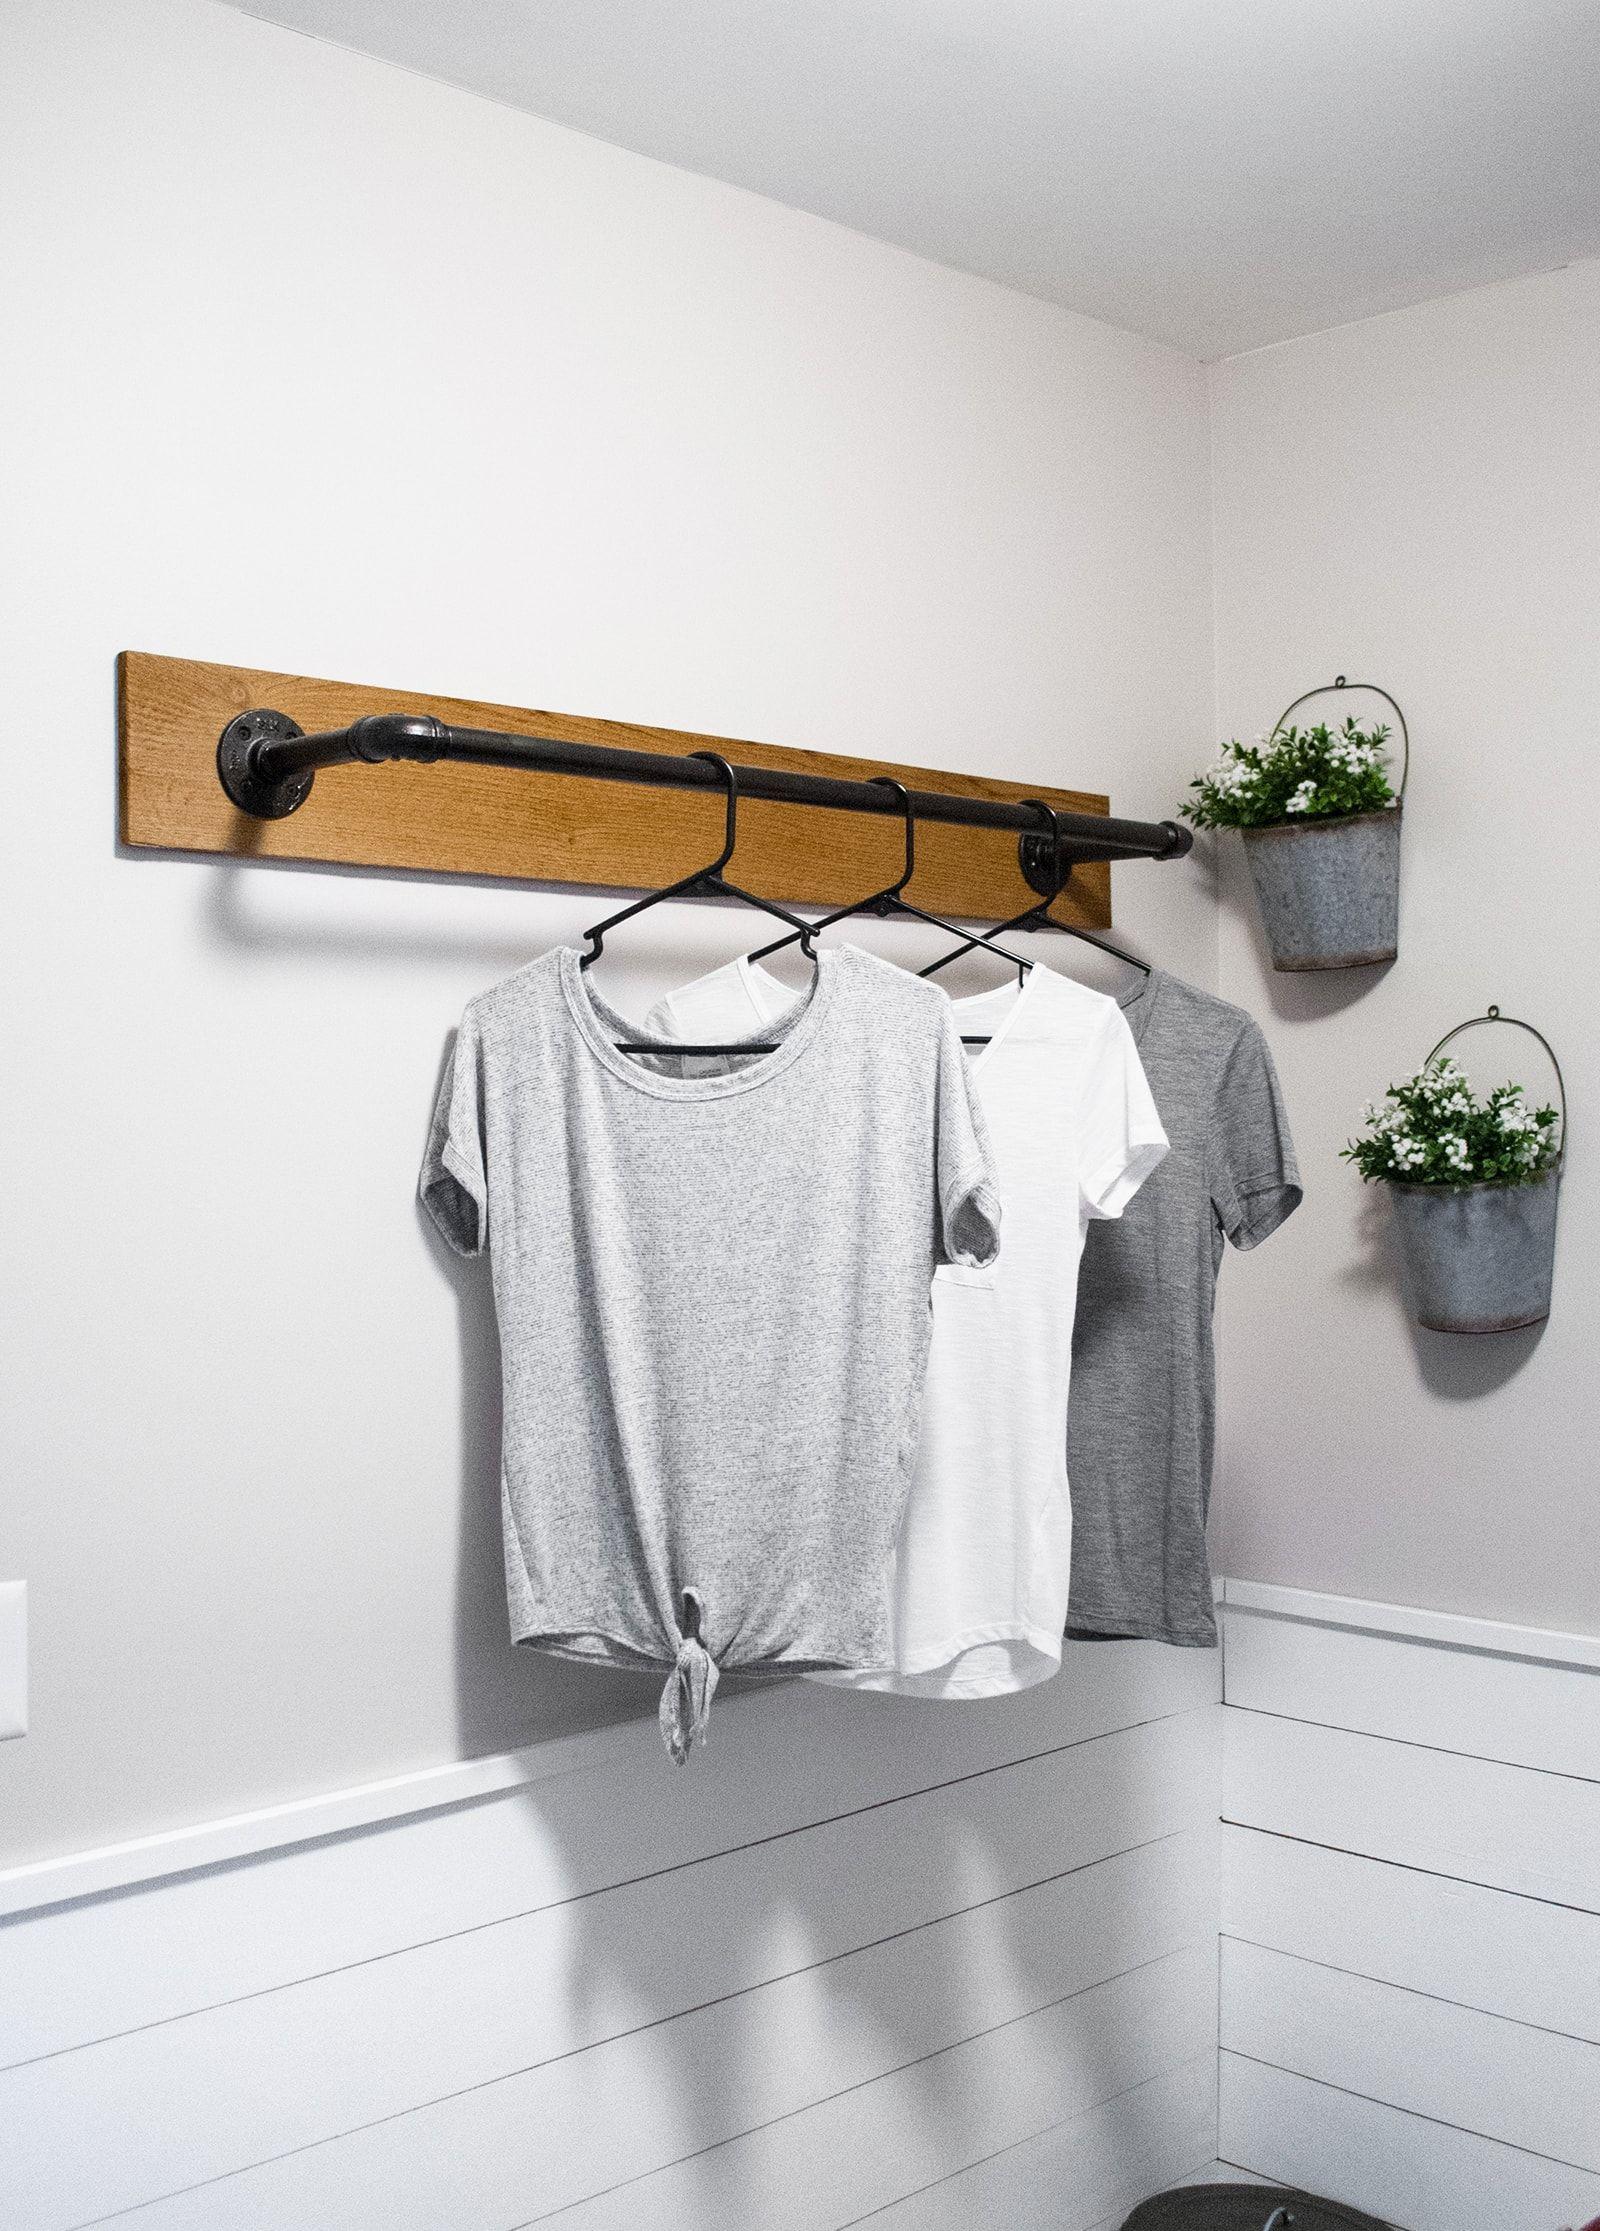 Diy Wall Mounted Clothing Rack Laundry Room Diy Laundry Rack